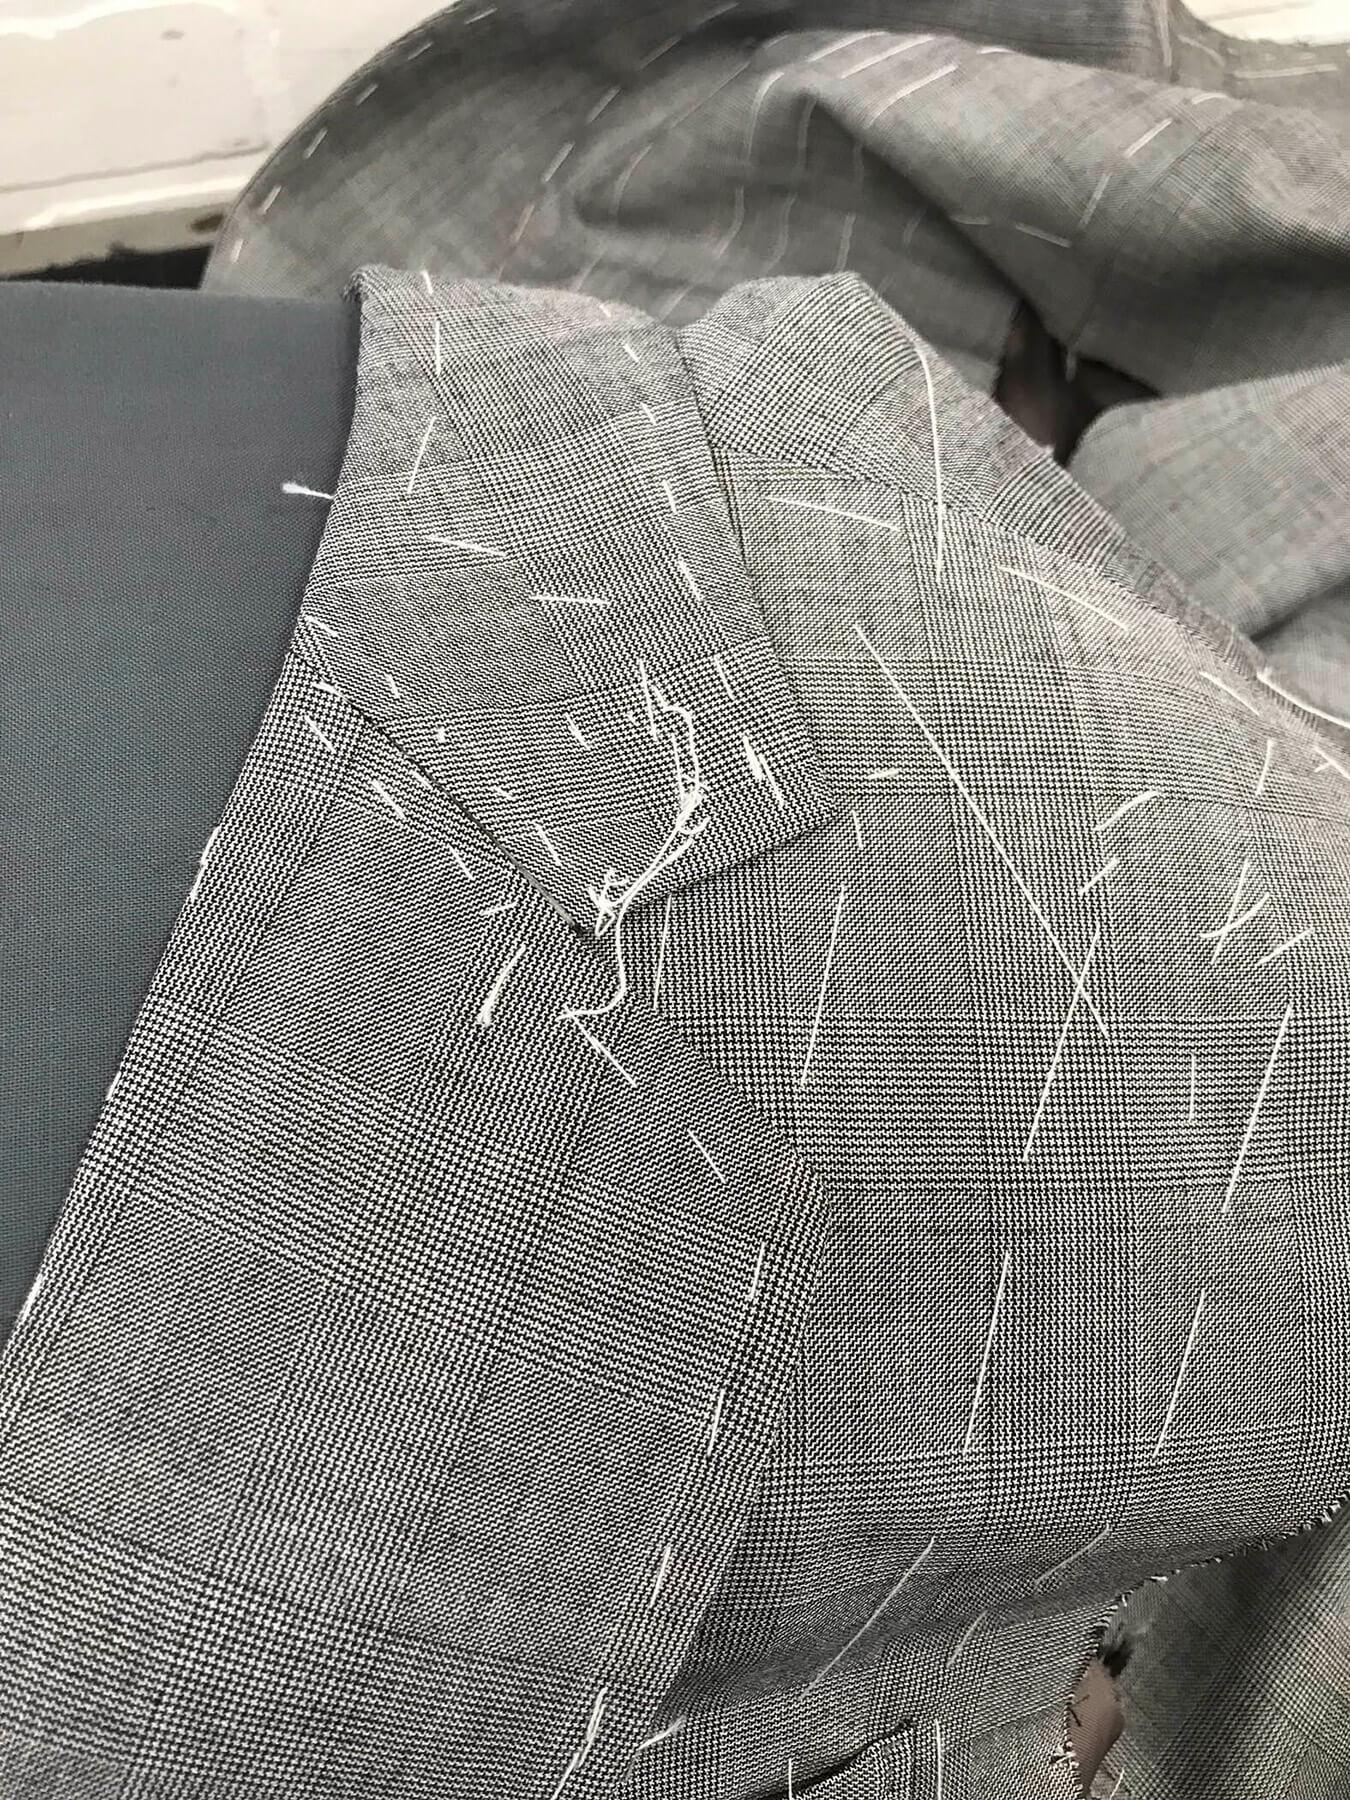 Bespoke Tailored Collars.